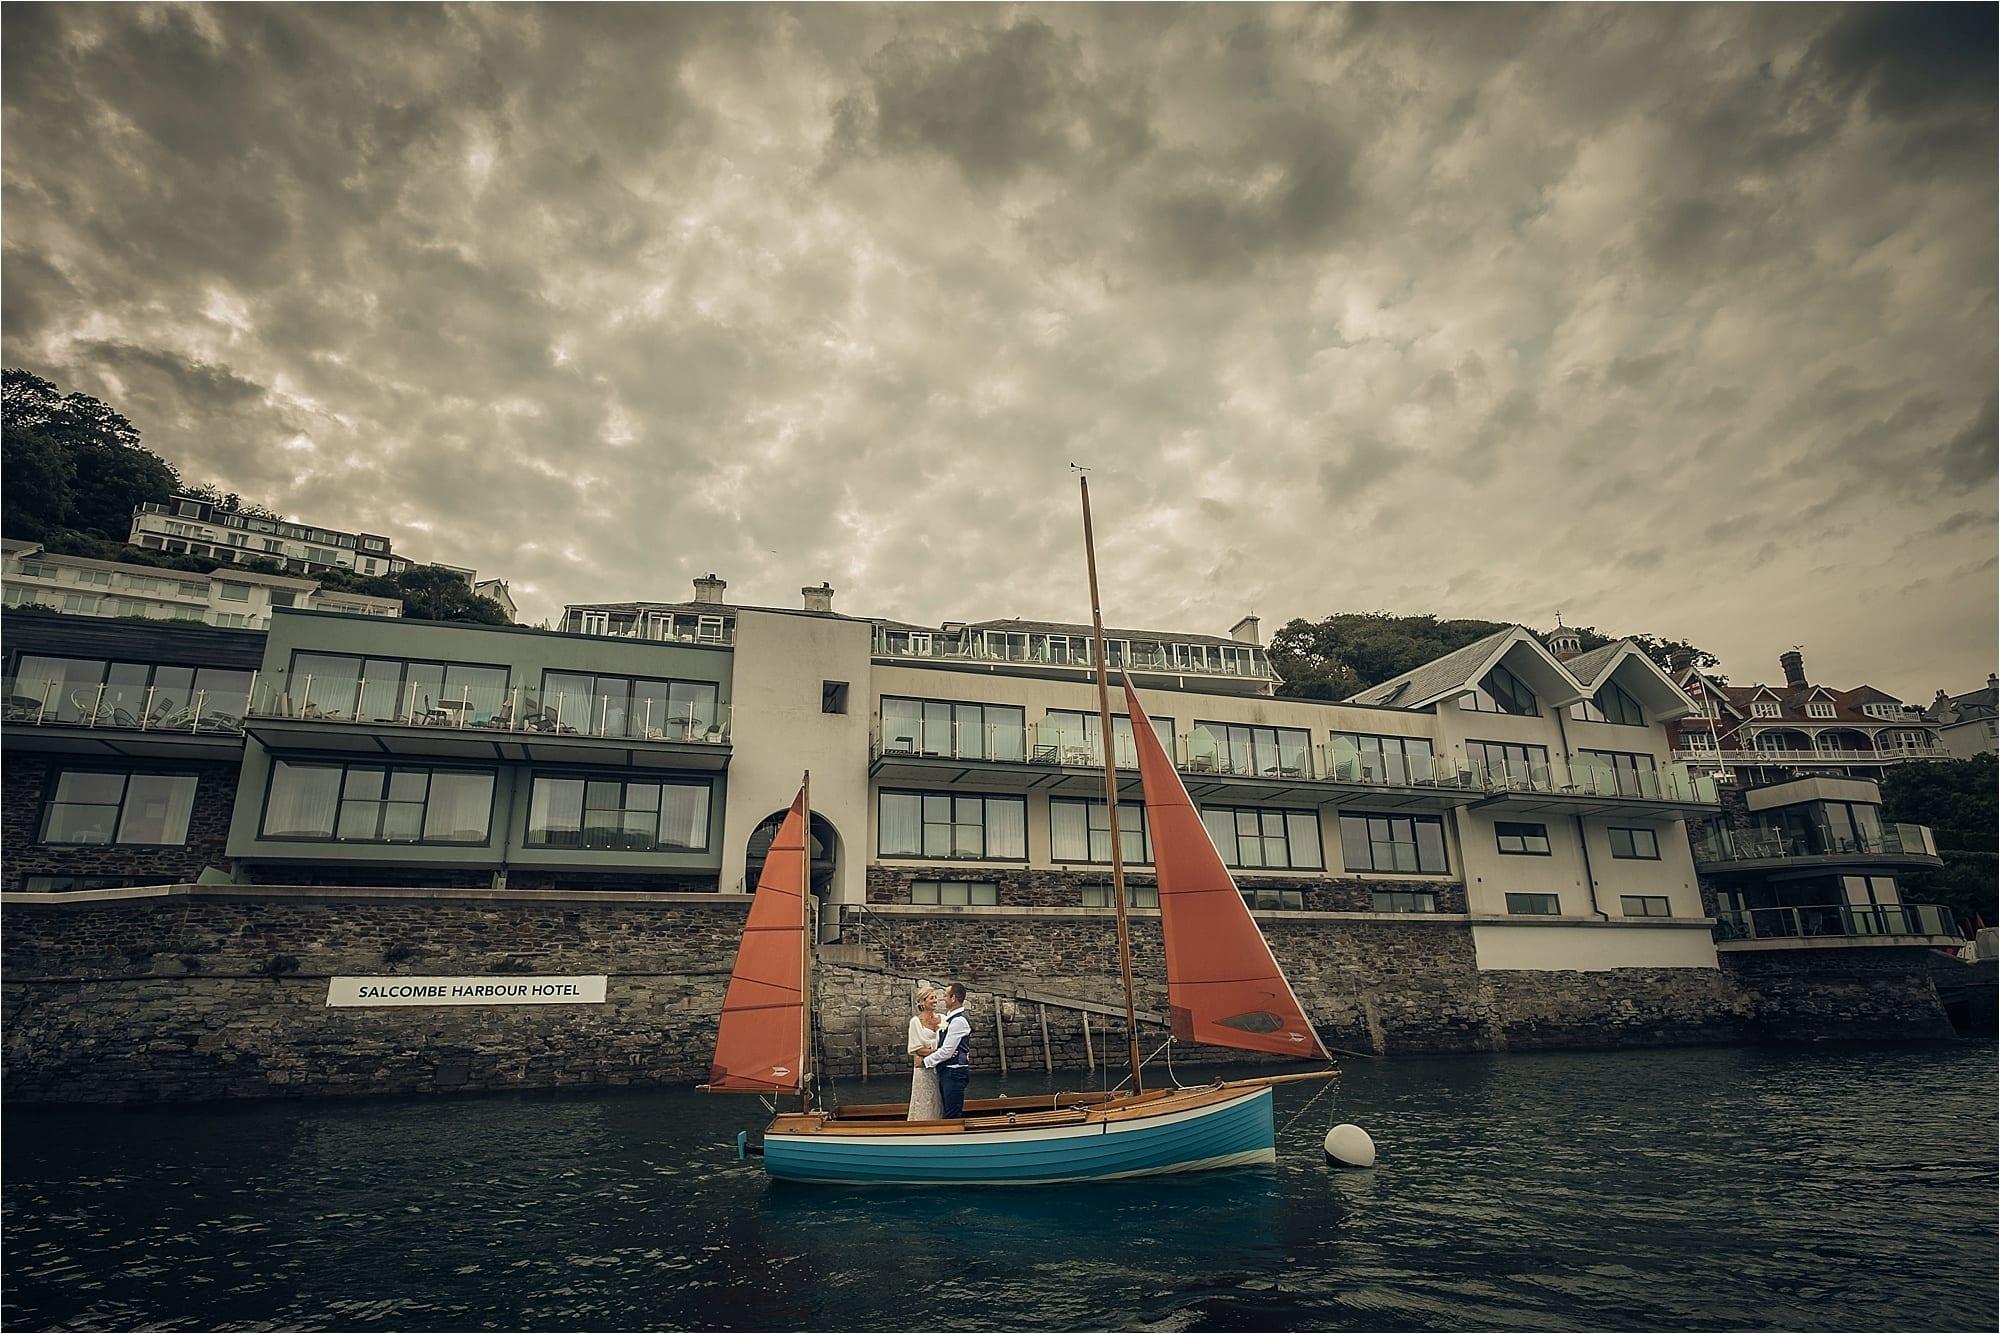 Salcombe Harbour Hotel wedding photographers